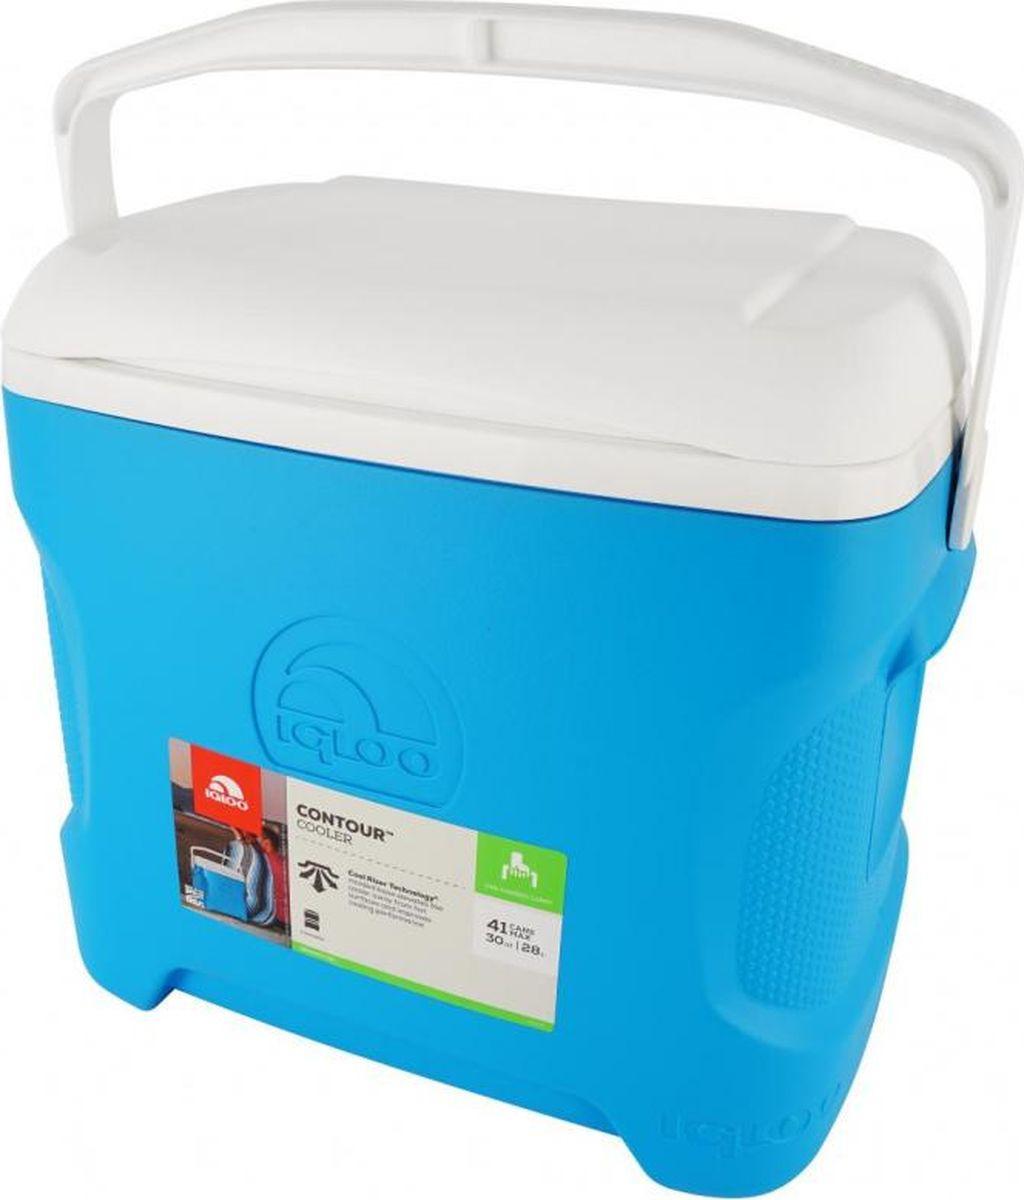 Изотермический контейнер Igloo Contour, 00049792, синий, 47 х 34 х 43 см igloo изотермический контейнер igloo playmate pal jucetwh